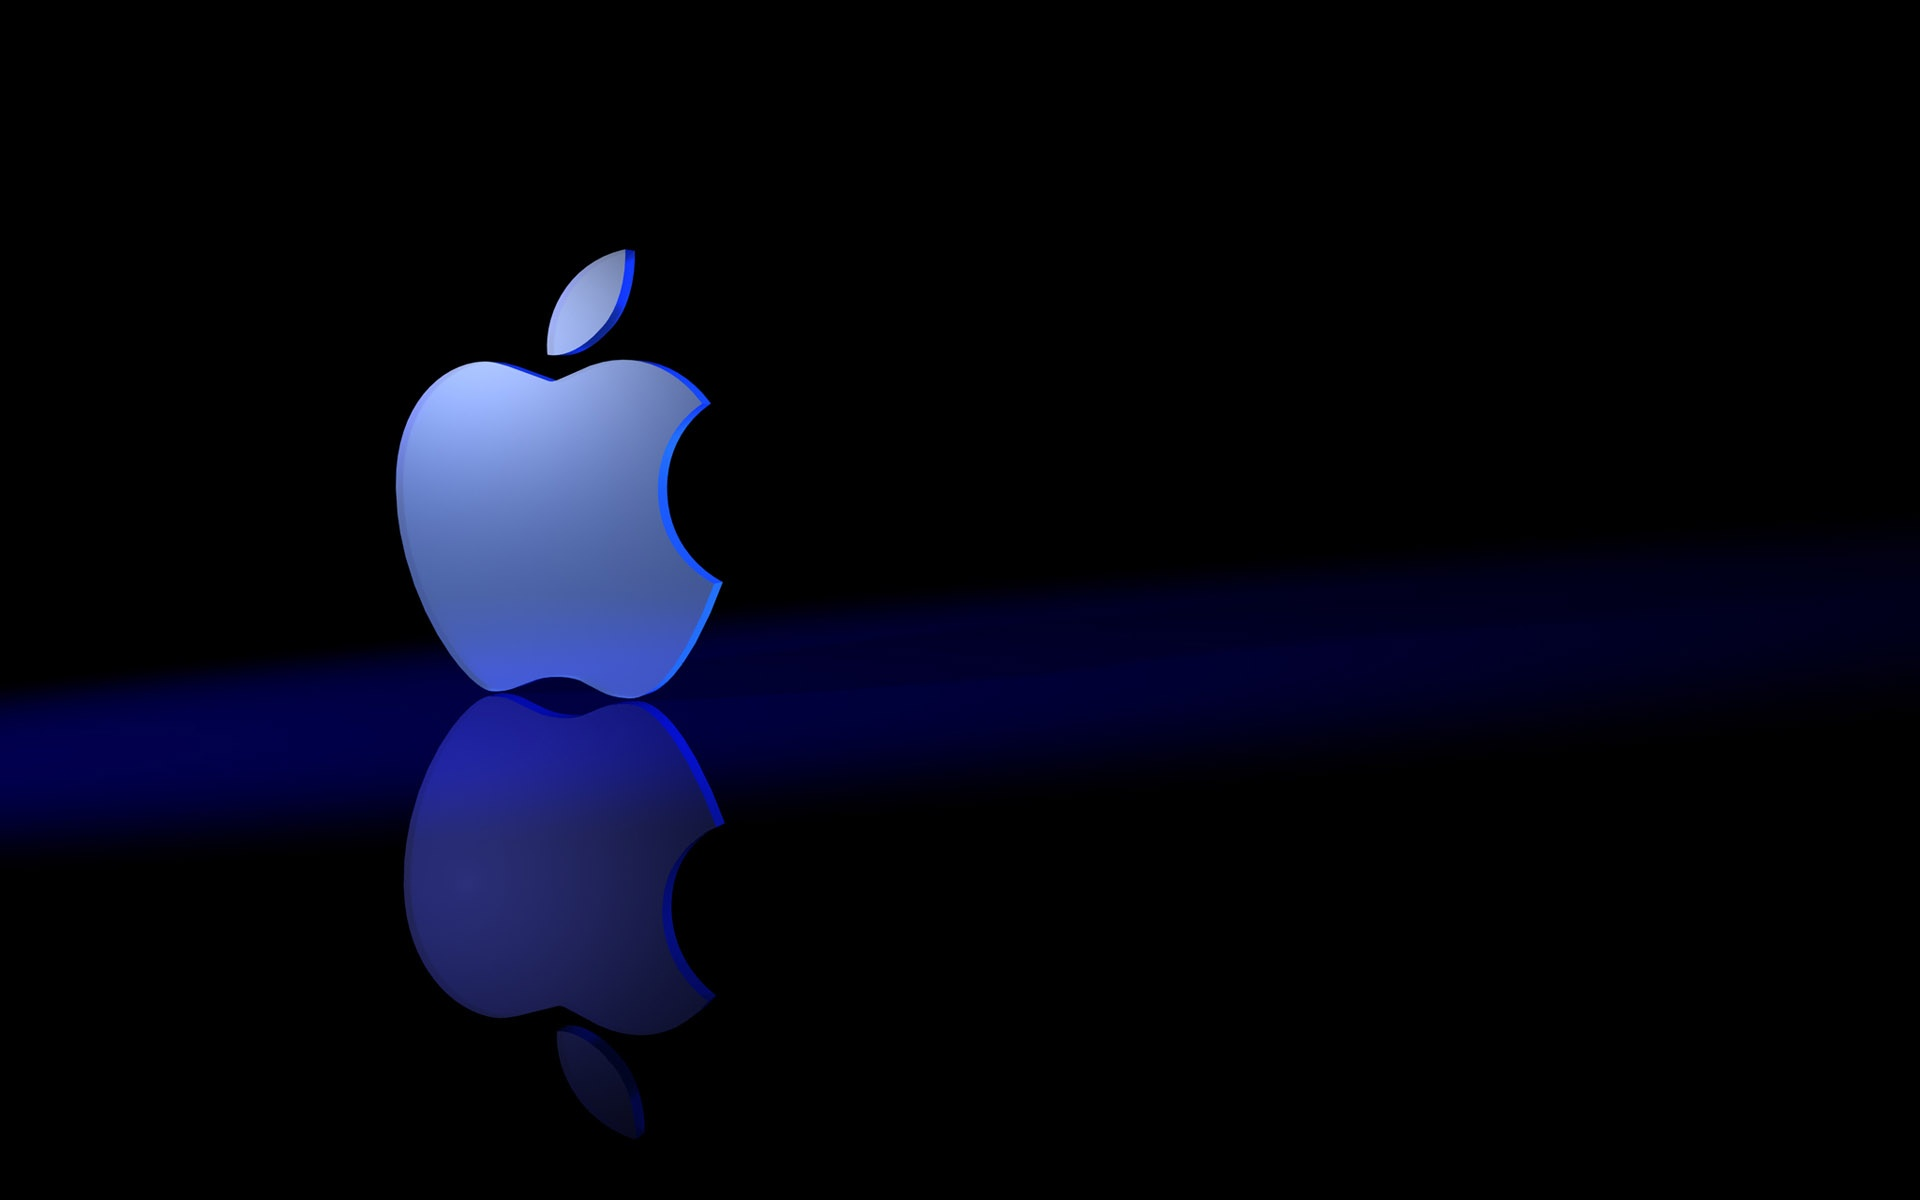 apple wallpaper hd,black,blue,light,sky,darkness